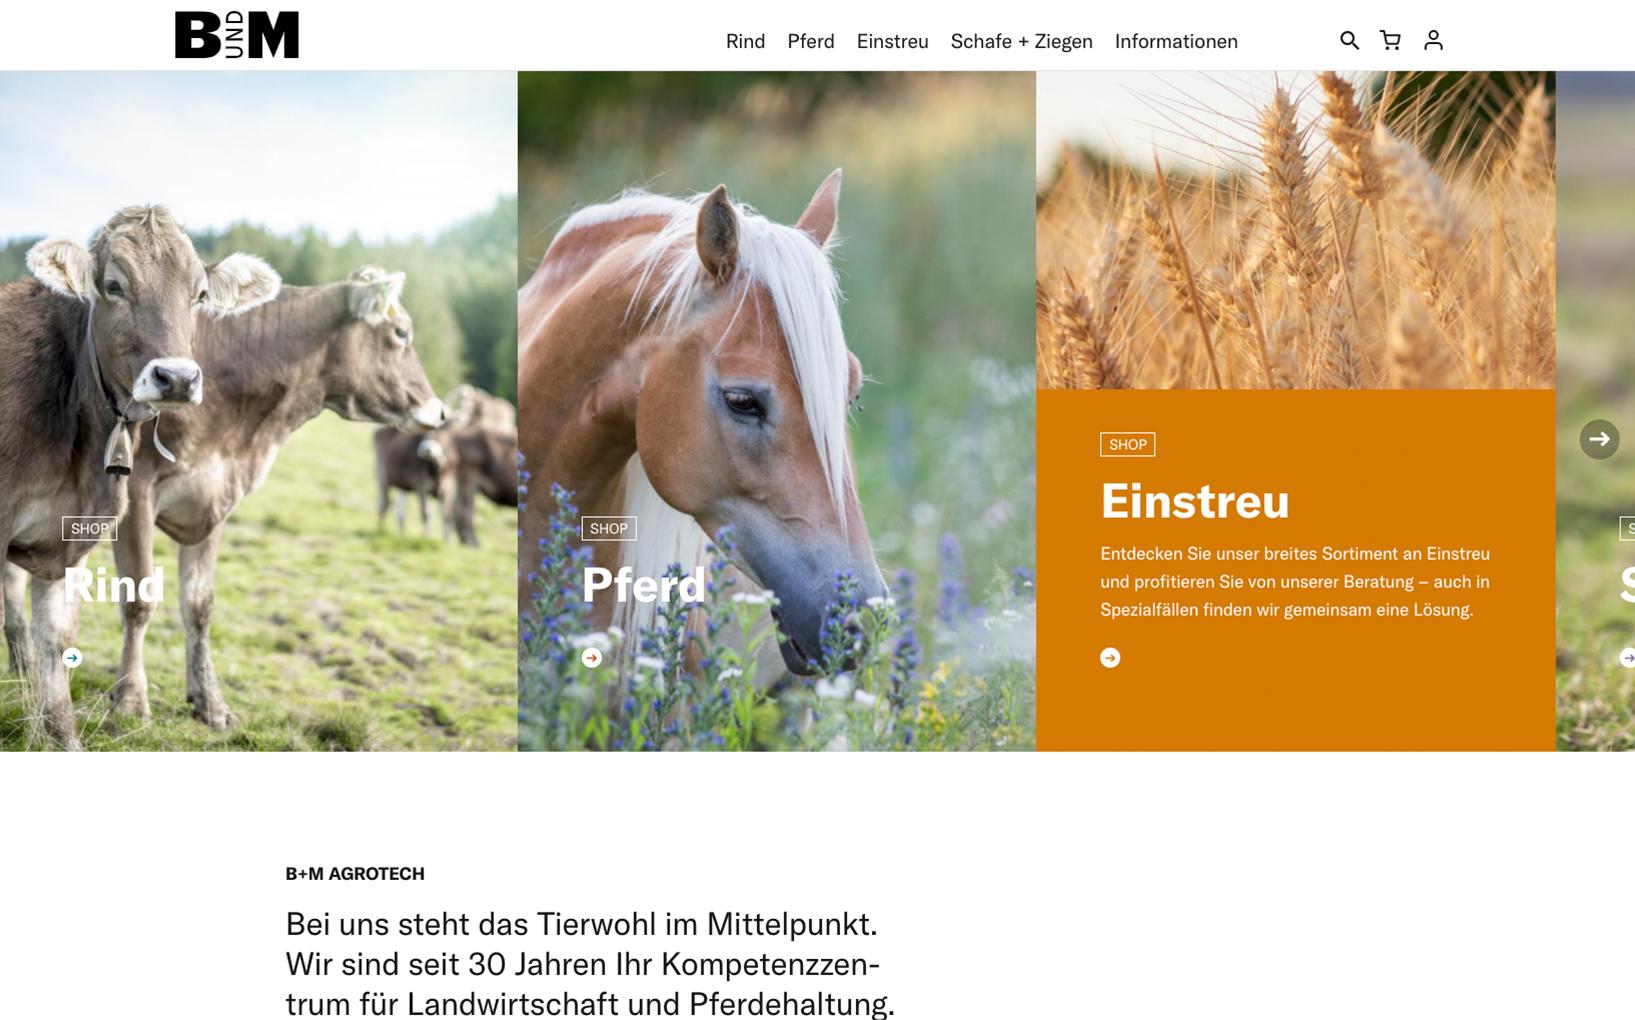 B+M Haus- und Agrotech AG